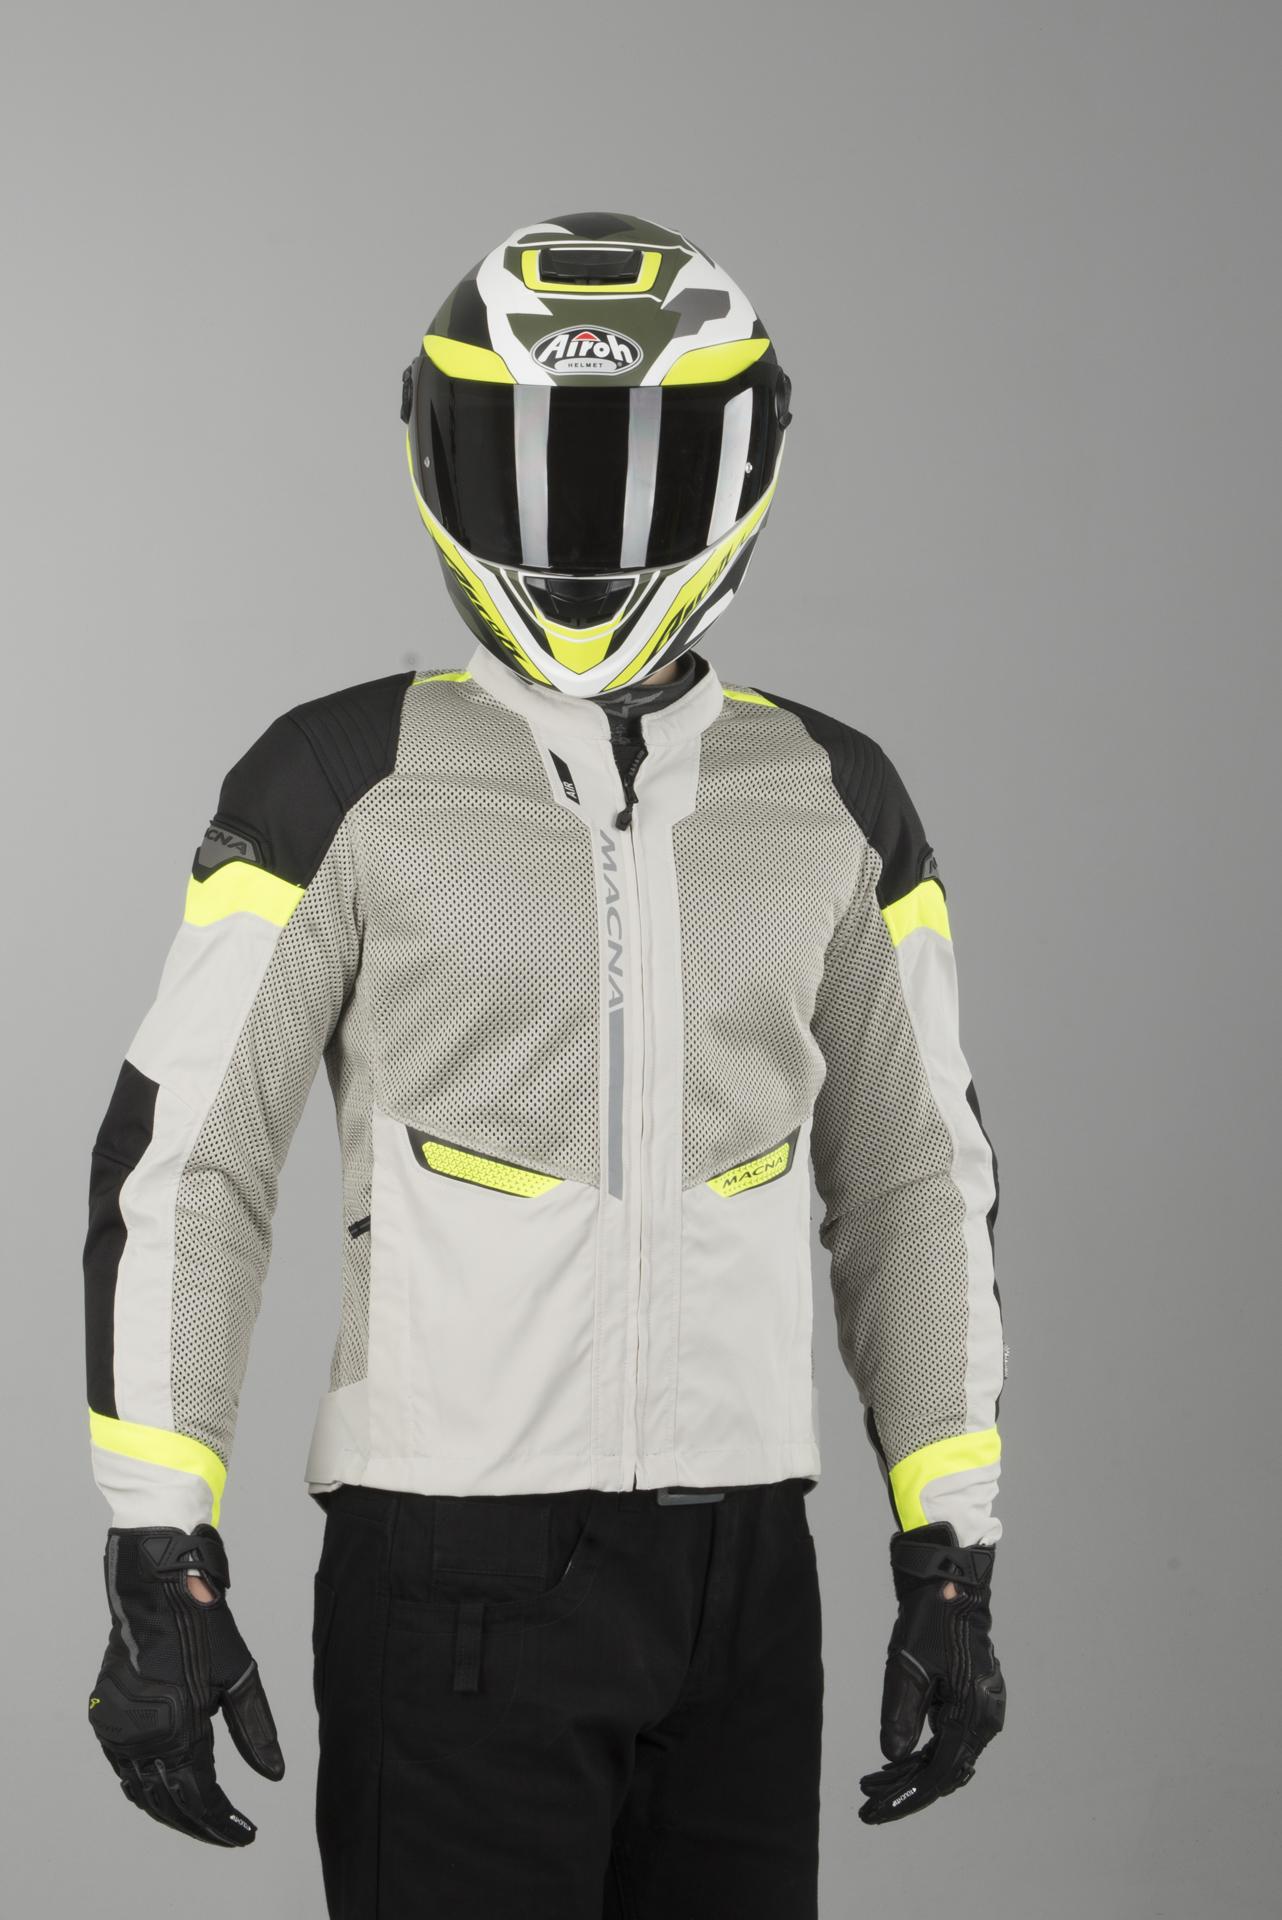 Macna Event Night Eye Black Neon Yellow Mesh Motorcycle Jacket Free Shipping